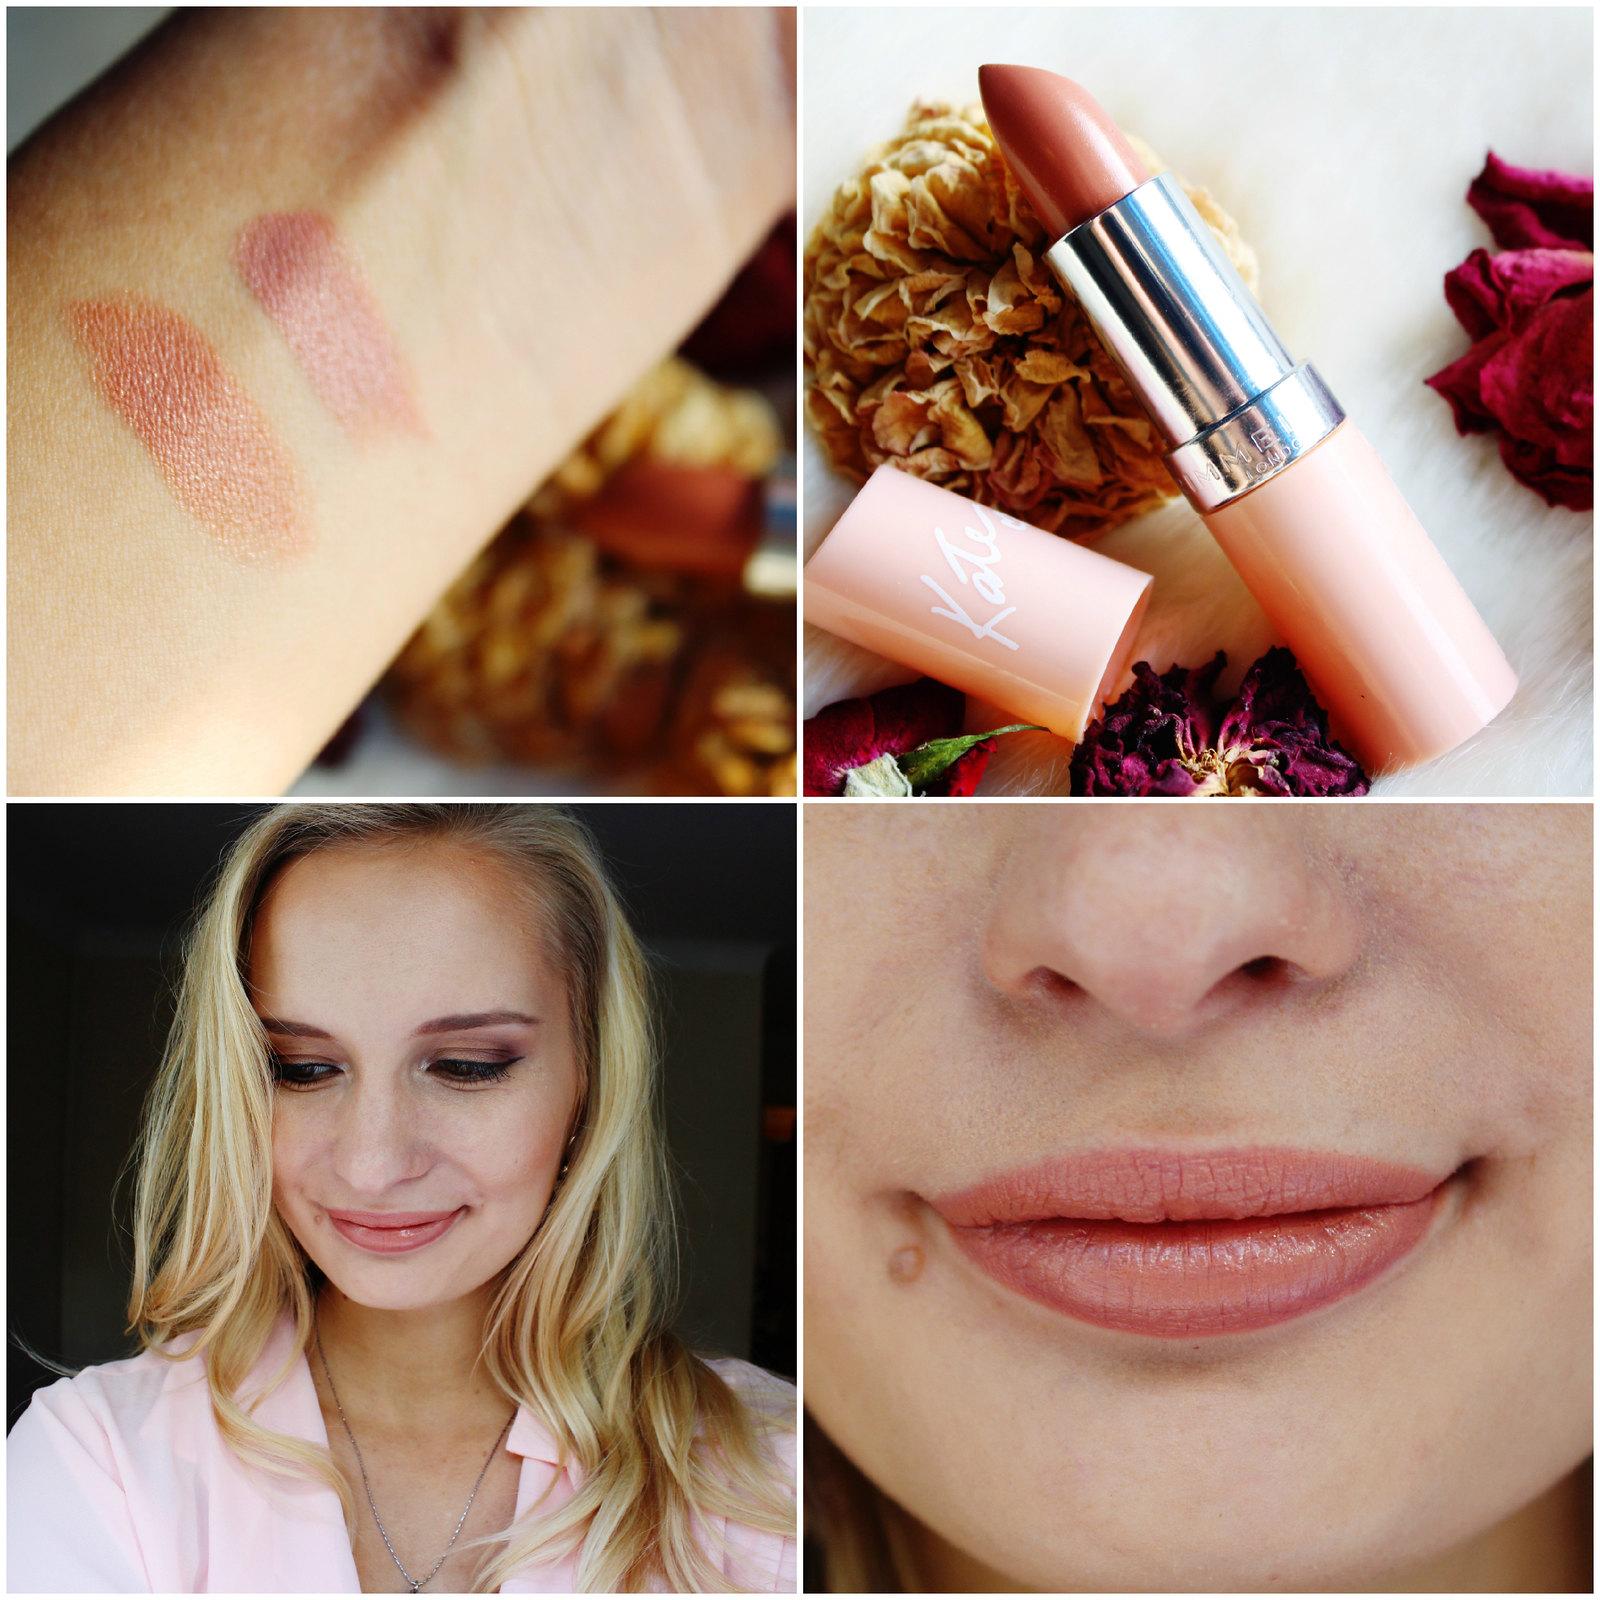 Rimmel London Lasting Finish Lipstick Nude Collection, 45